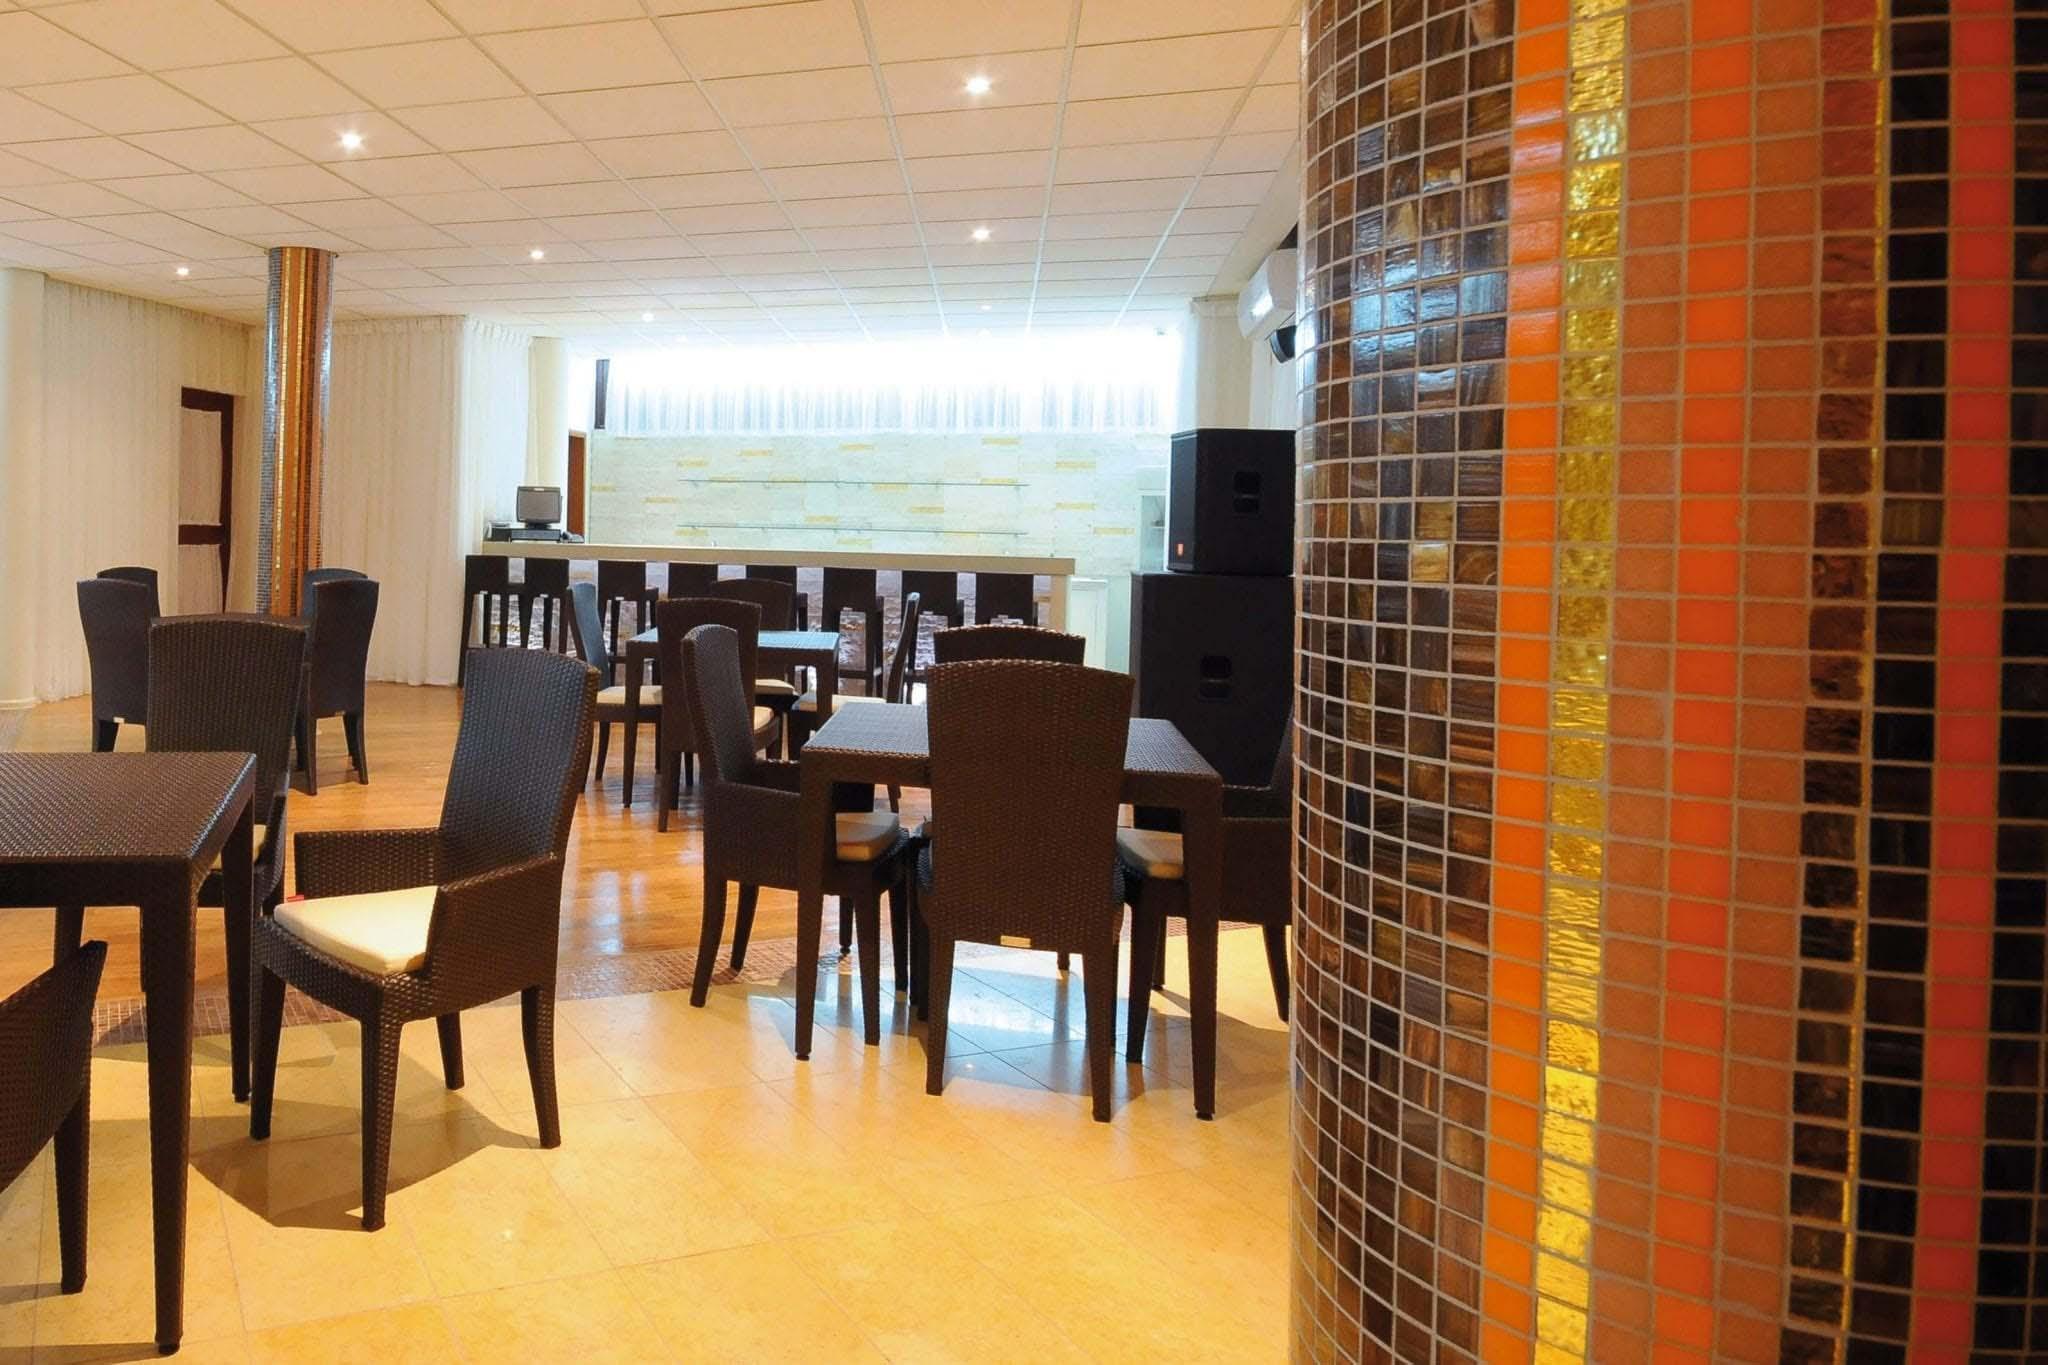 Citizien Kofi Club in Accra Ghana slide